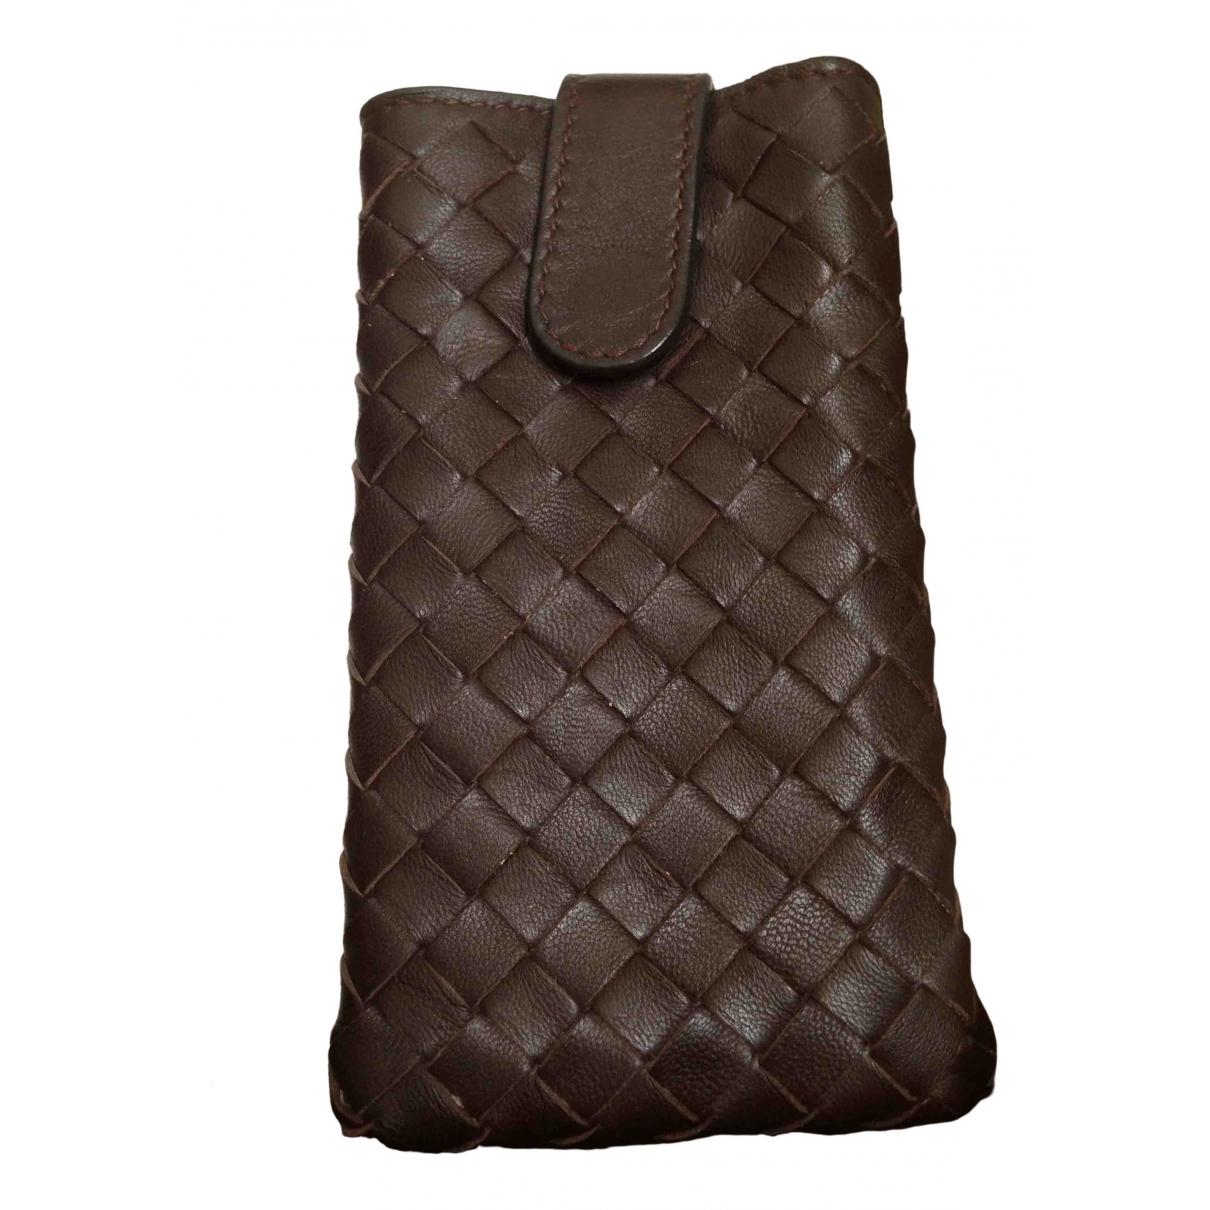 Bottega Veneta \N Brown Leather Accessories for Life & Living \N